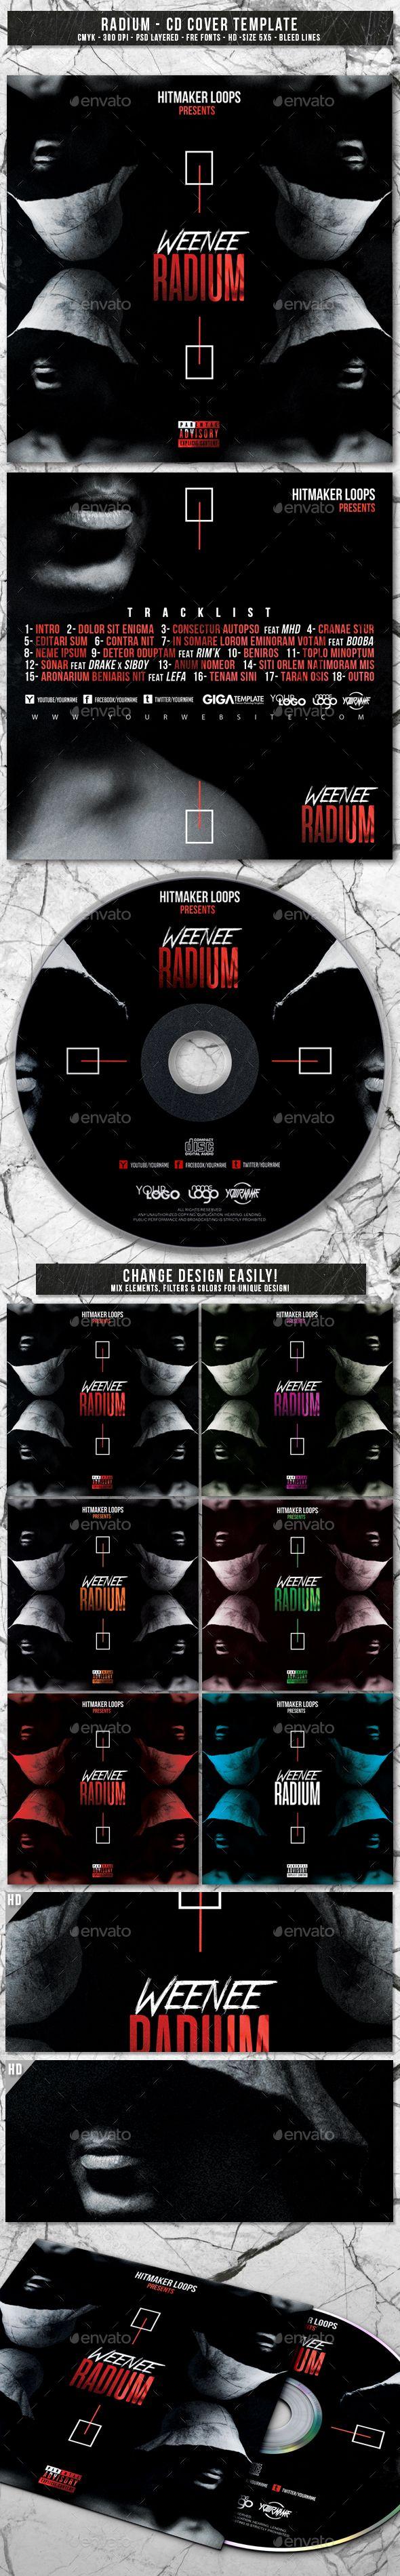 radium album cd mixtape cover template fonts logos icons